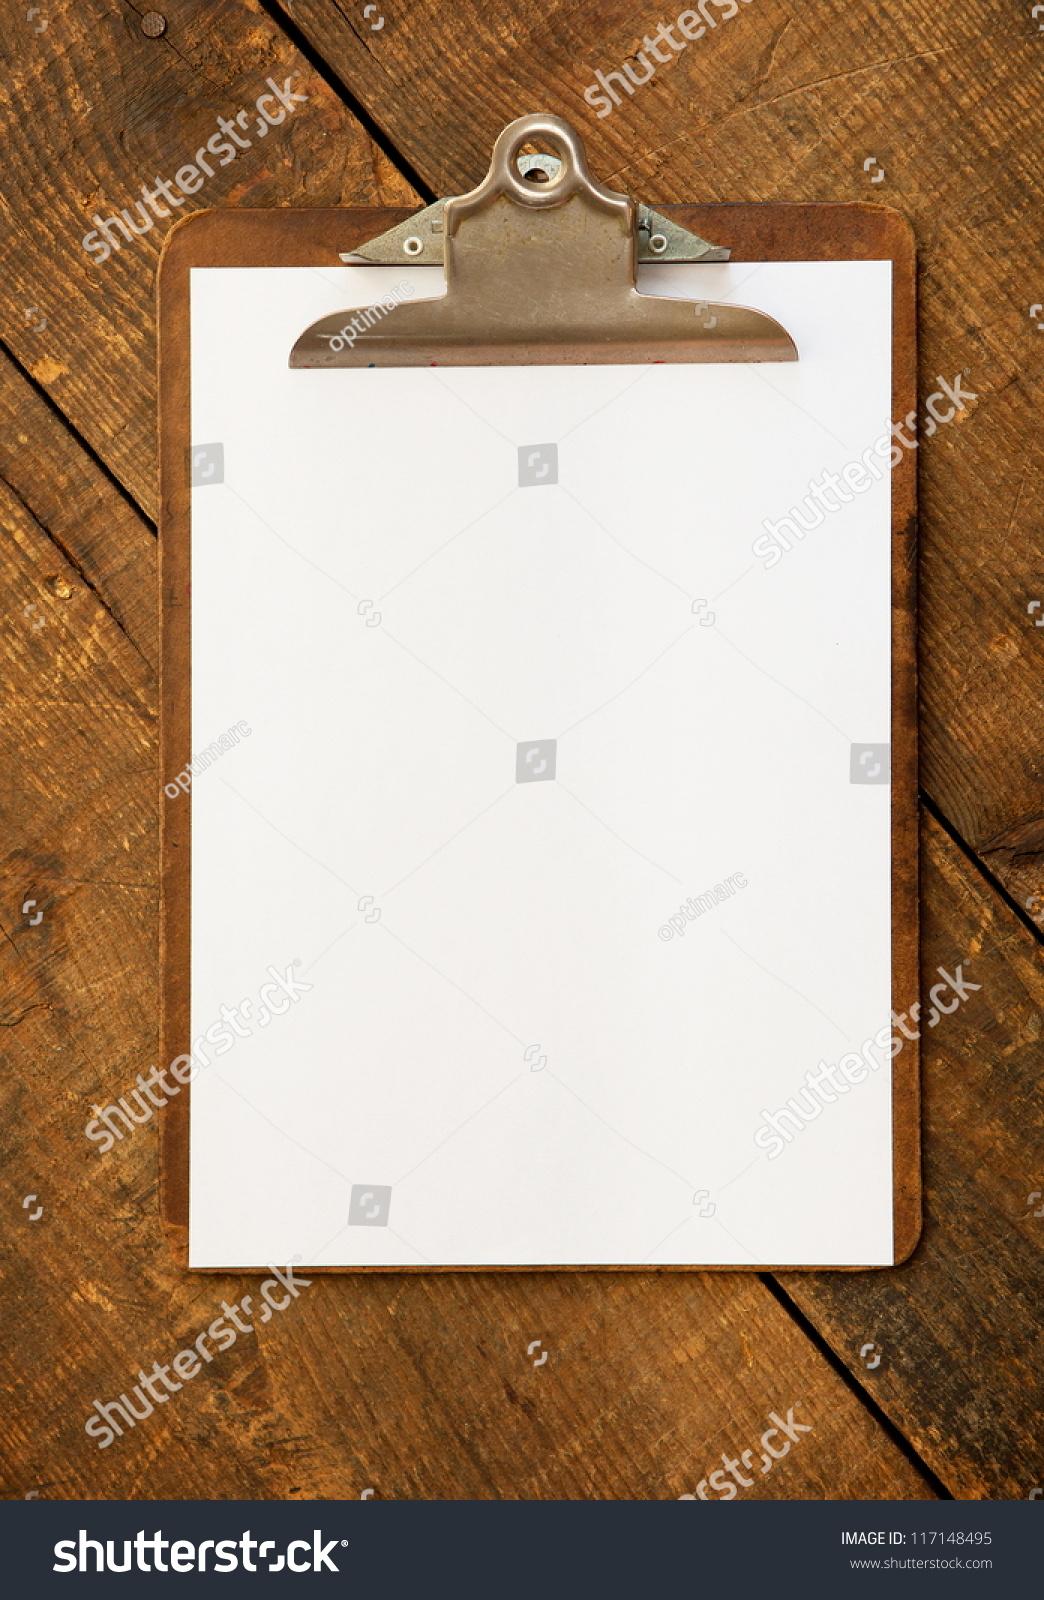 ppt 背景 背景图片 边框 模板 设计 相框 1044_1600 竖版 竖屏